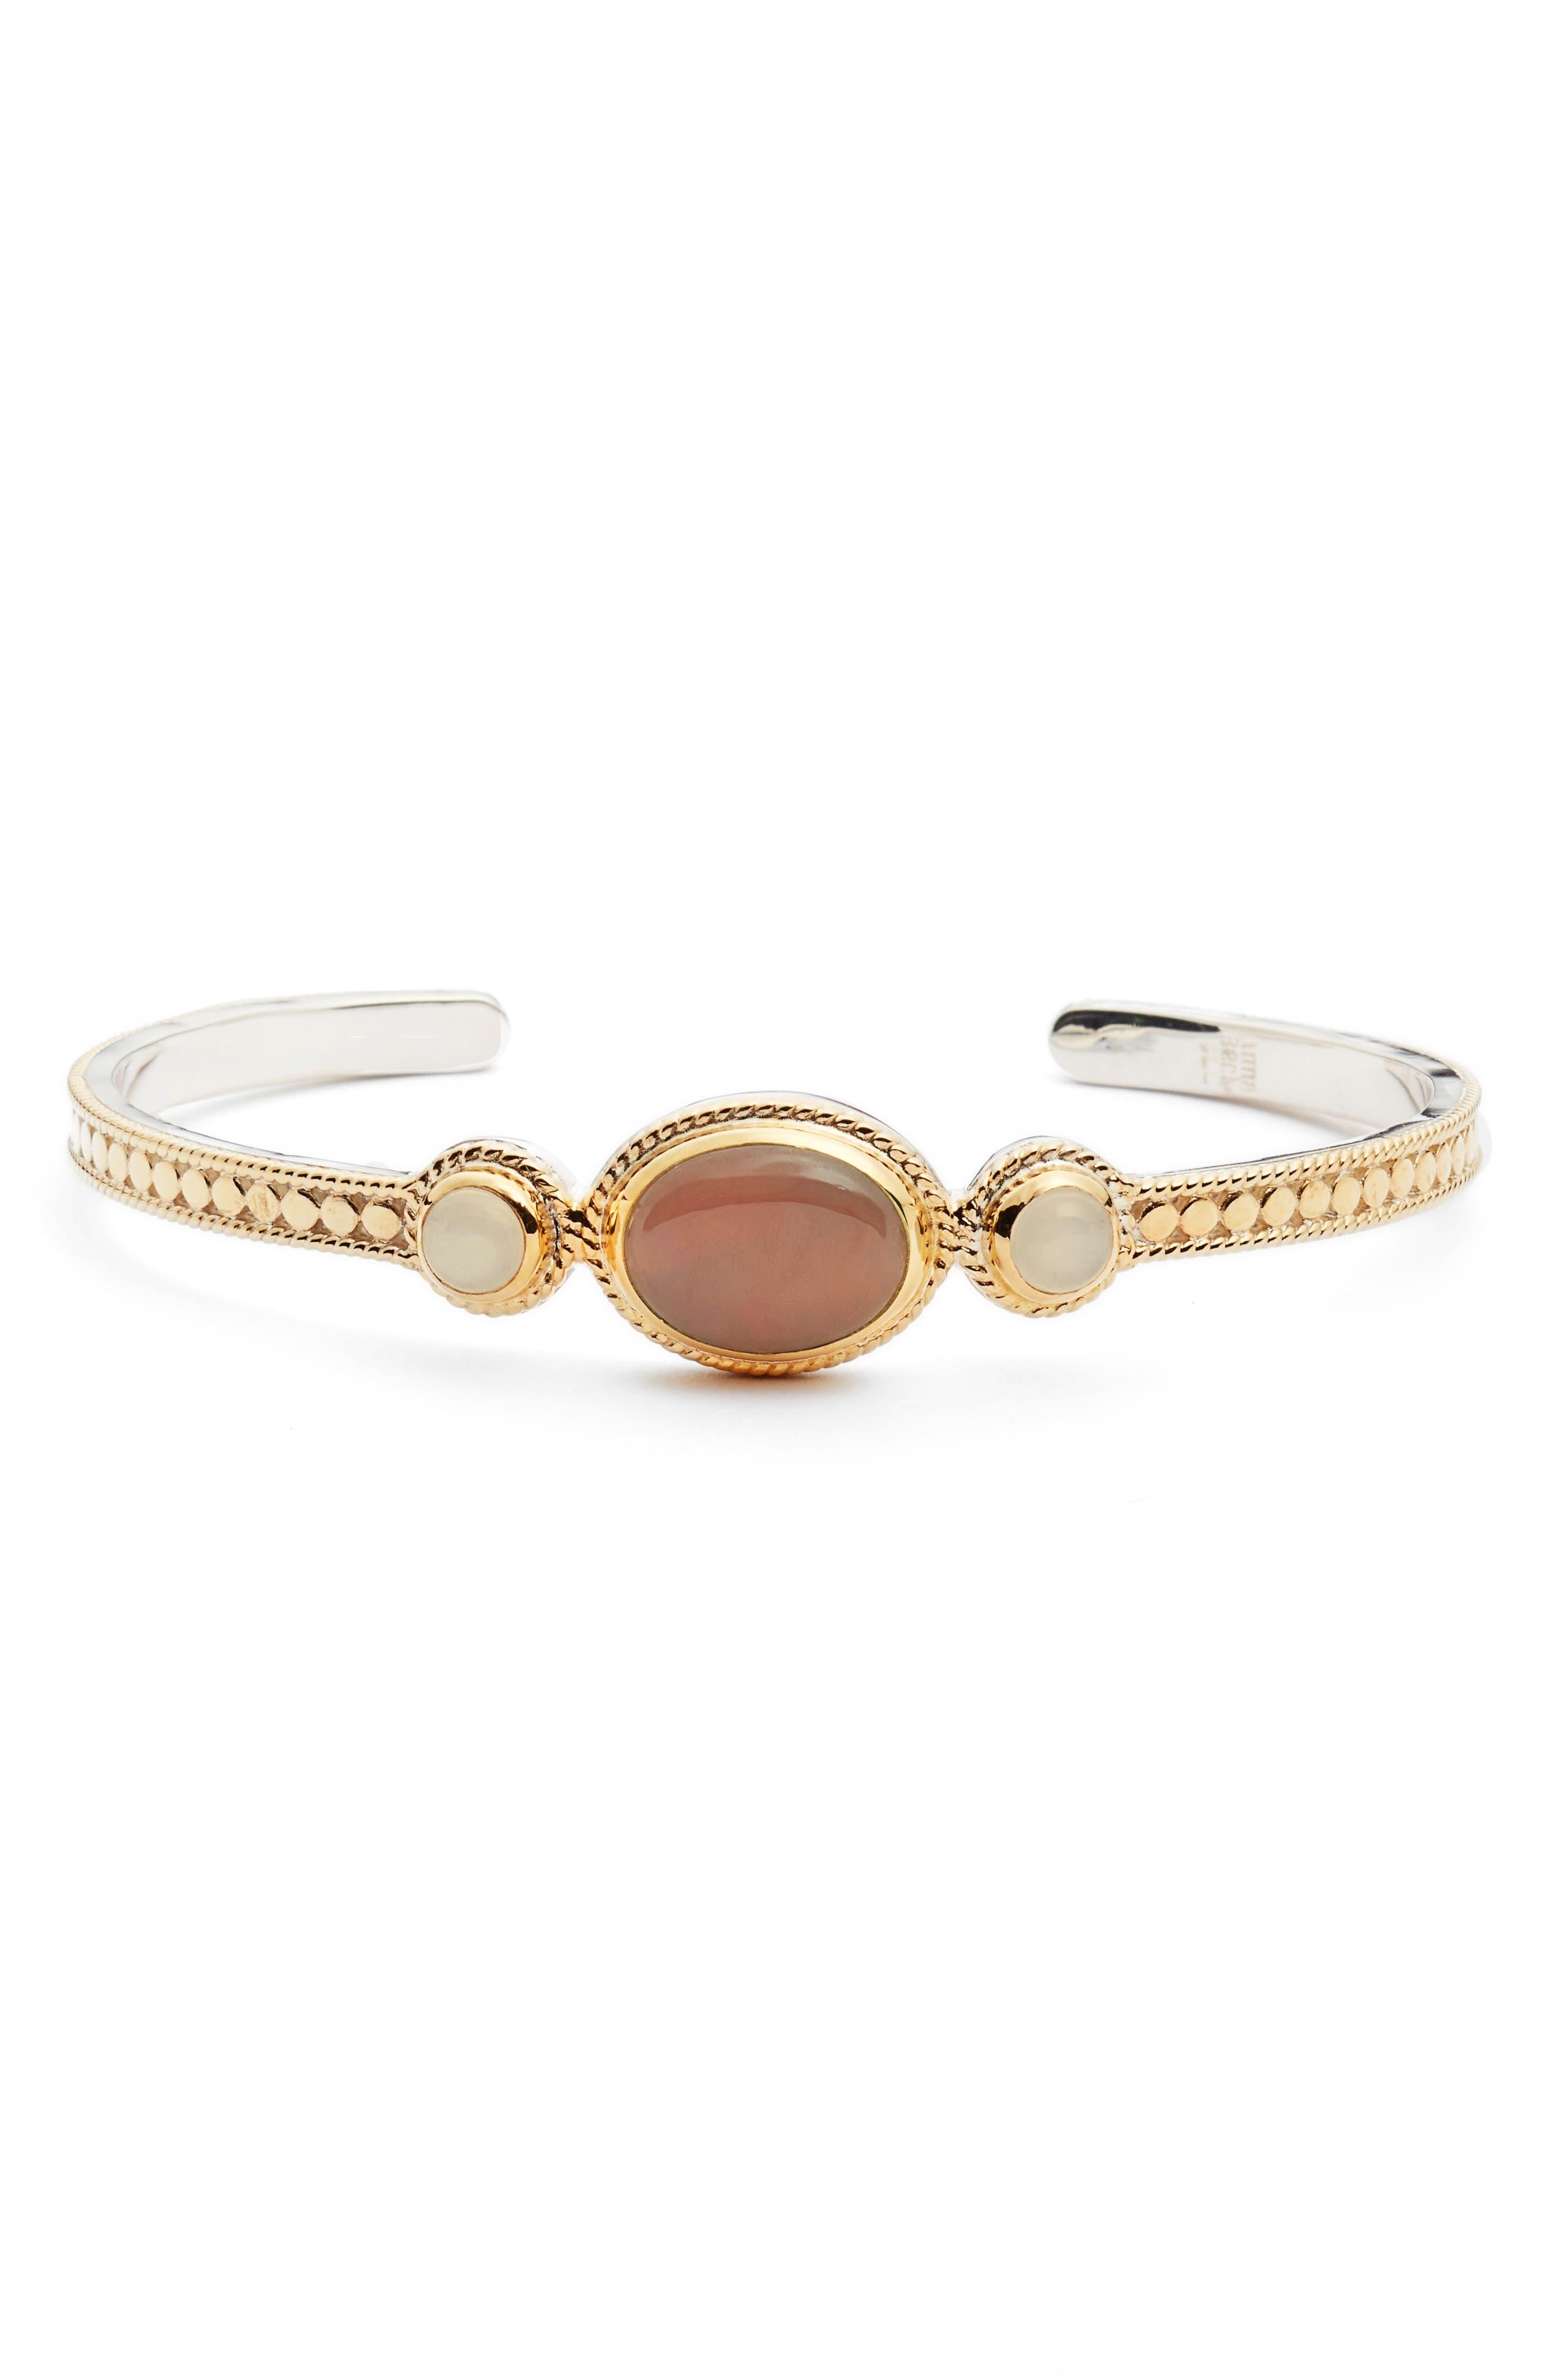 Guava Quartz & Moonstone Cuff Bracelet,                         Main,                         color, 950